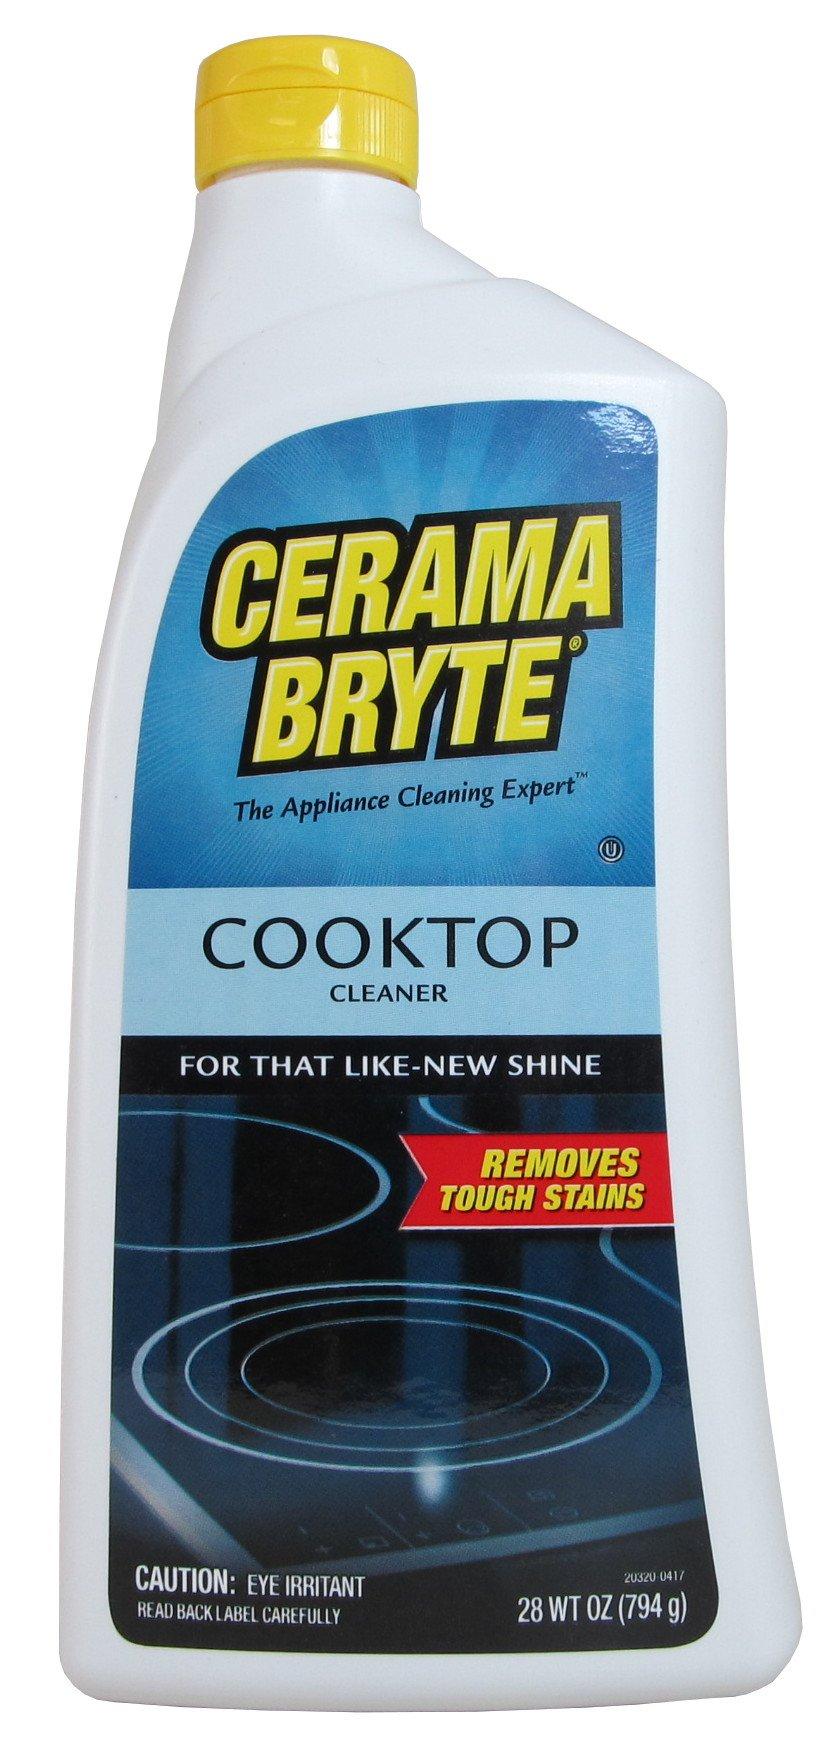 Cerama Bryte Ceramic Cooktop Cleaner 28 Oz (Pack of 2) by Cerama Bryte (Image #1)